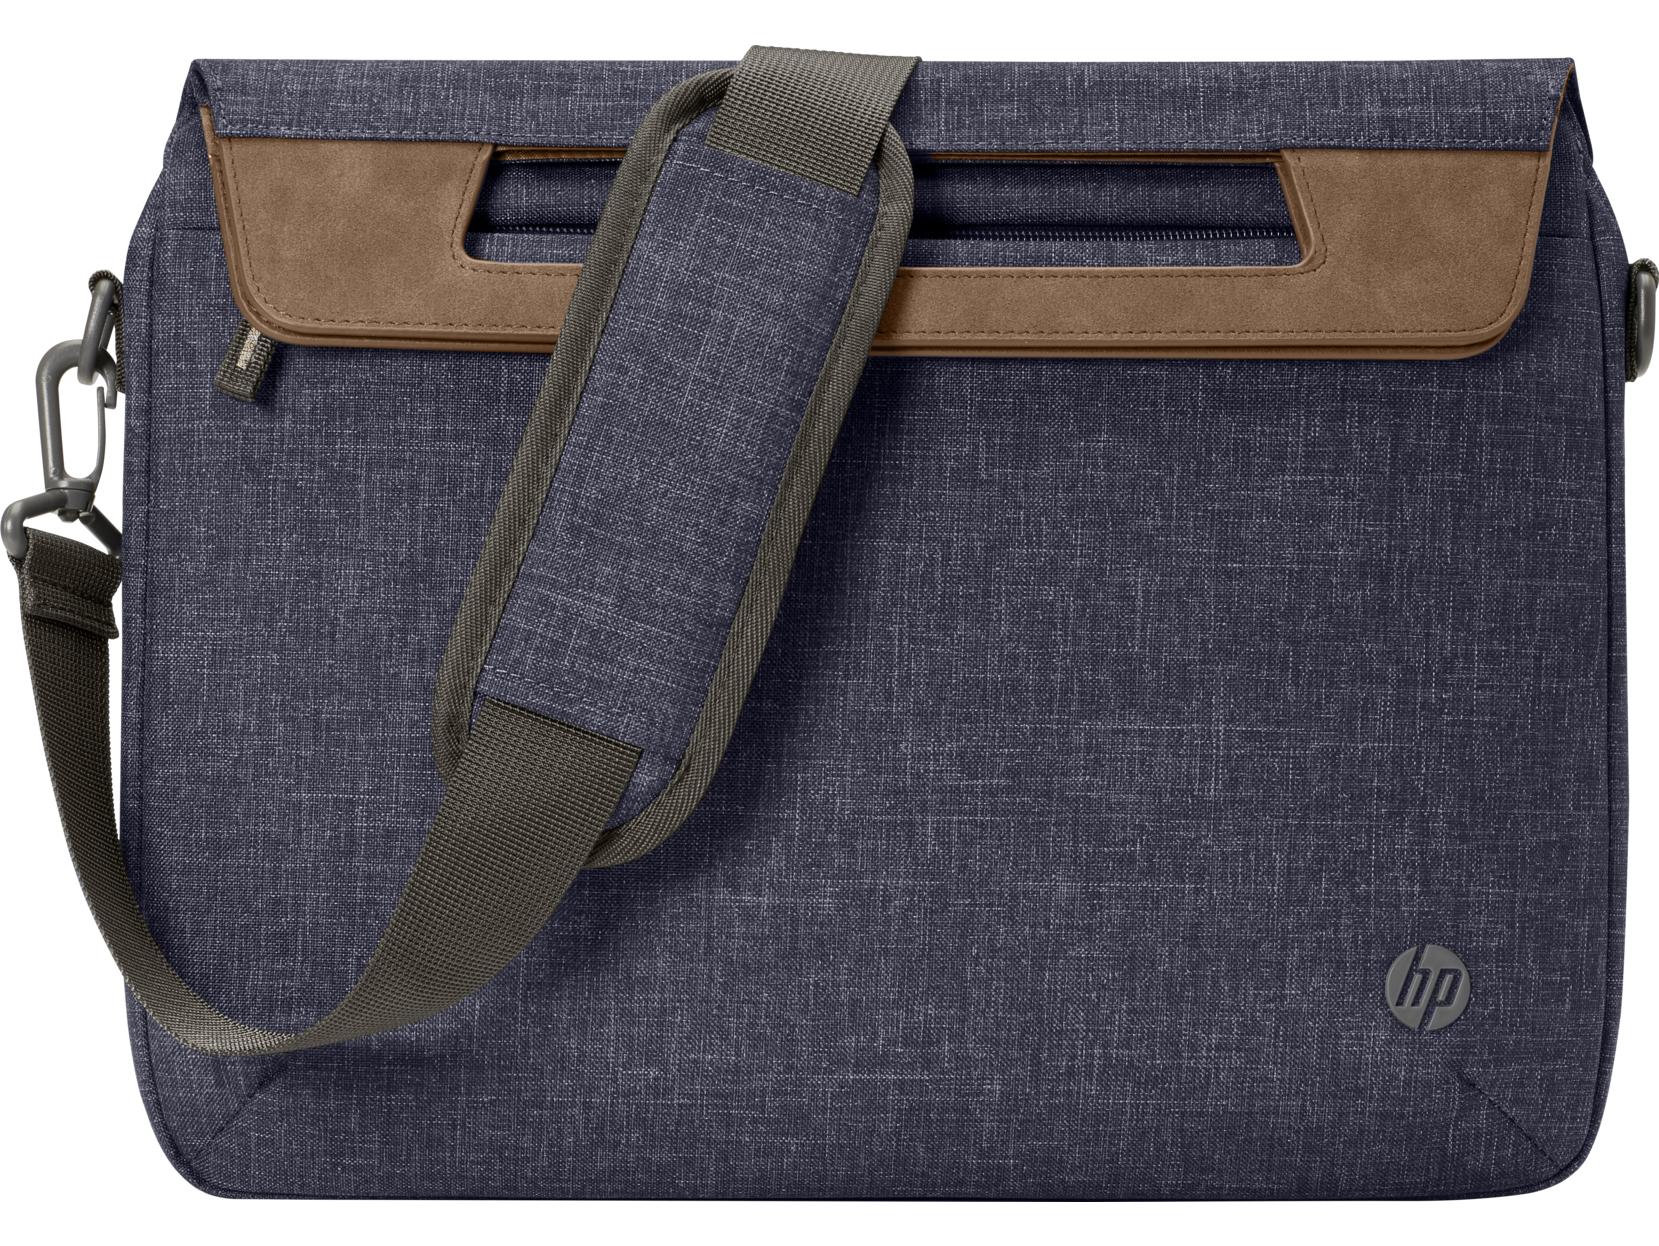 HP Renew 14 notebook case 35.6 cm (14